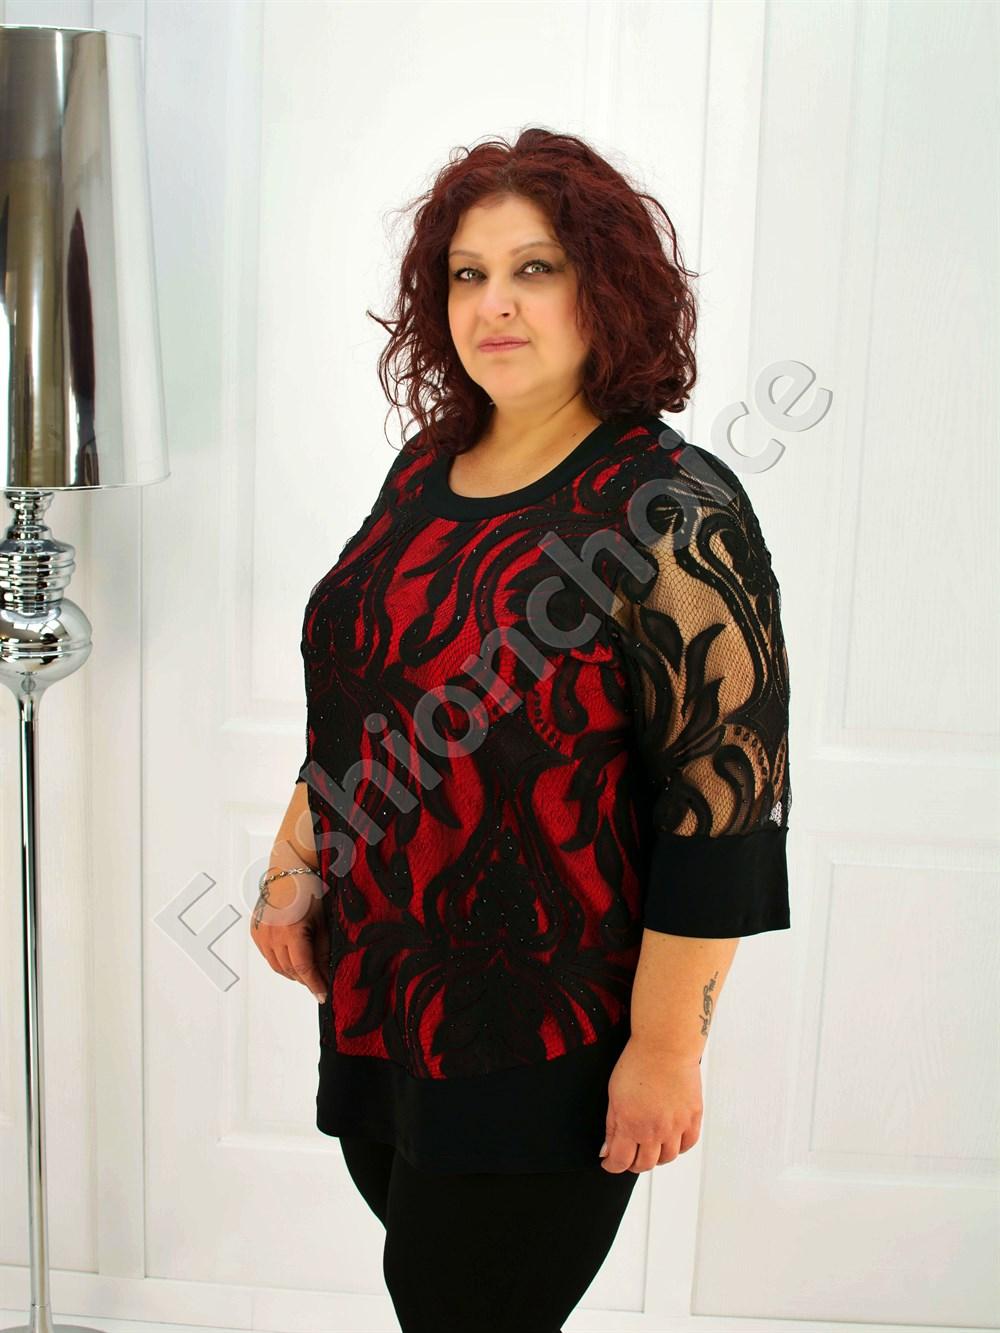 5f955f90d08d Γυναικεία μπλούζα μάυρη δαντέλα κωδ 104-3419 από το Fashionchoice